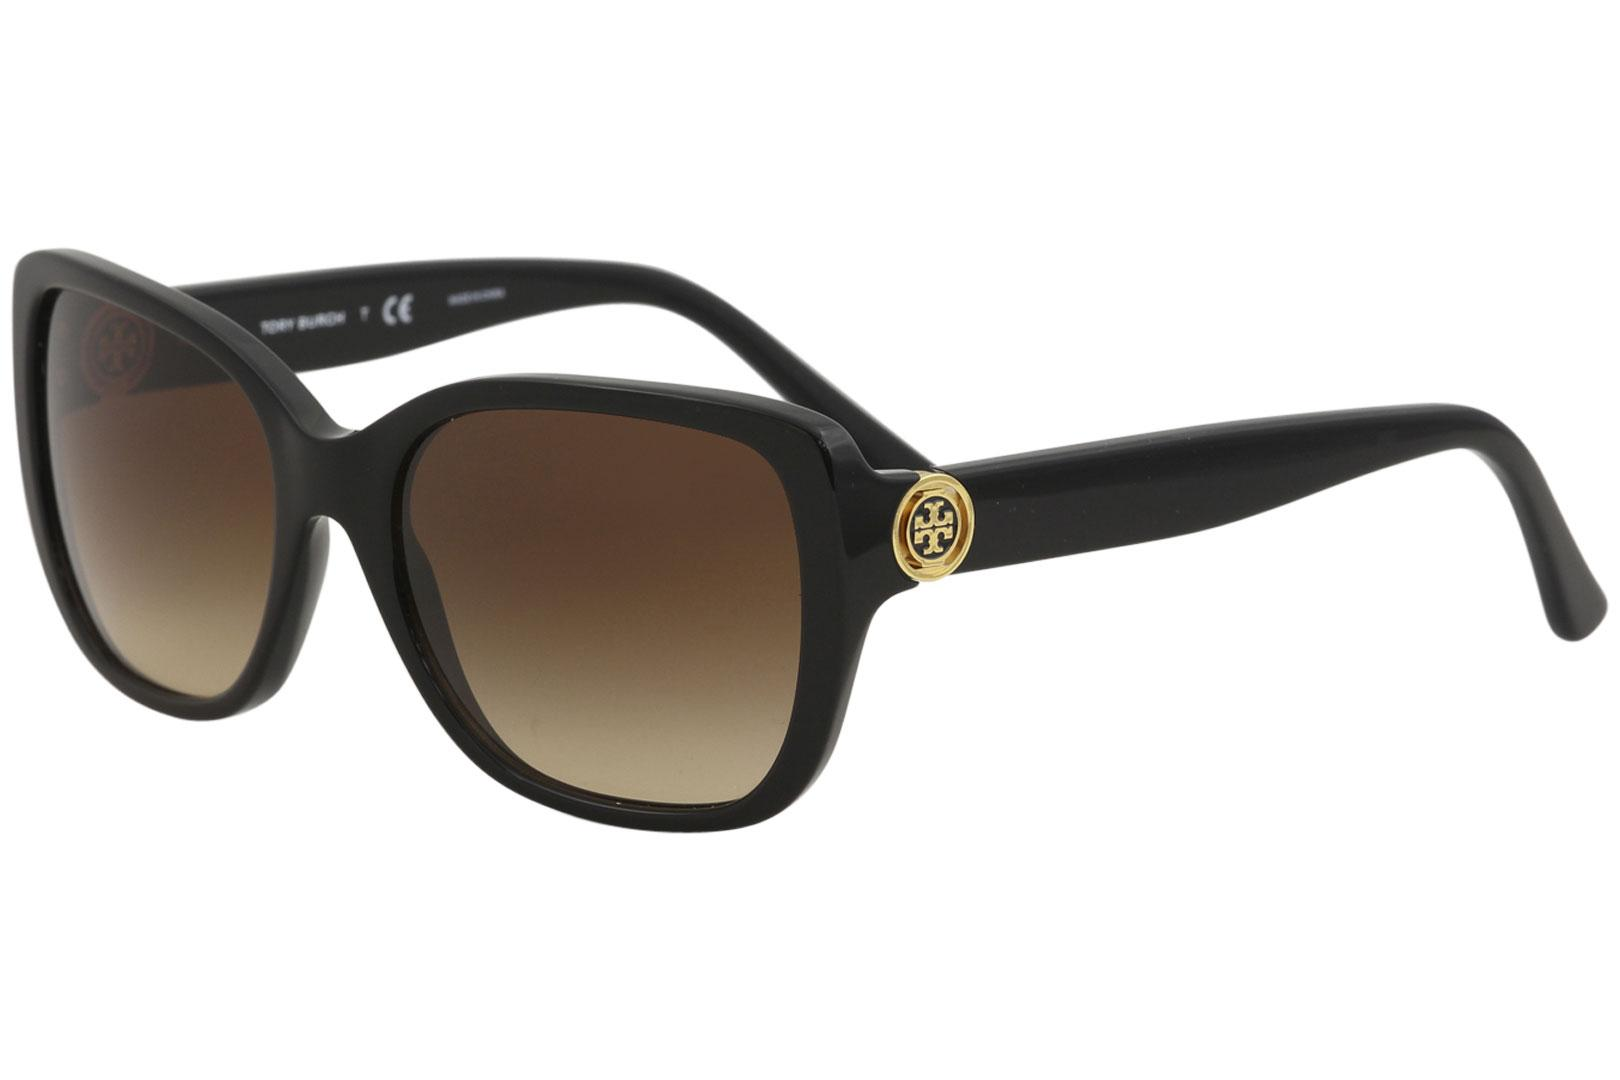 cfb8bc6141 Tory Burch Women s TY7086 TY 7086 Fashion Square Sunglasses